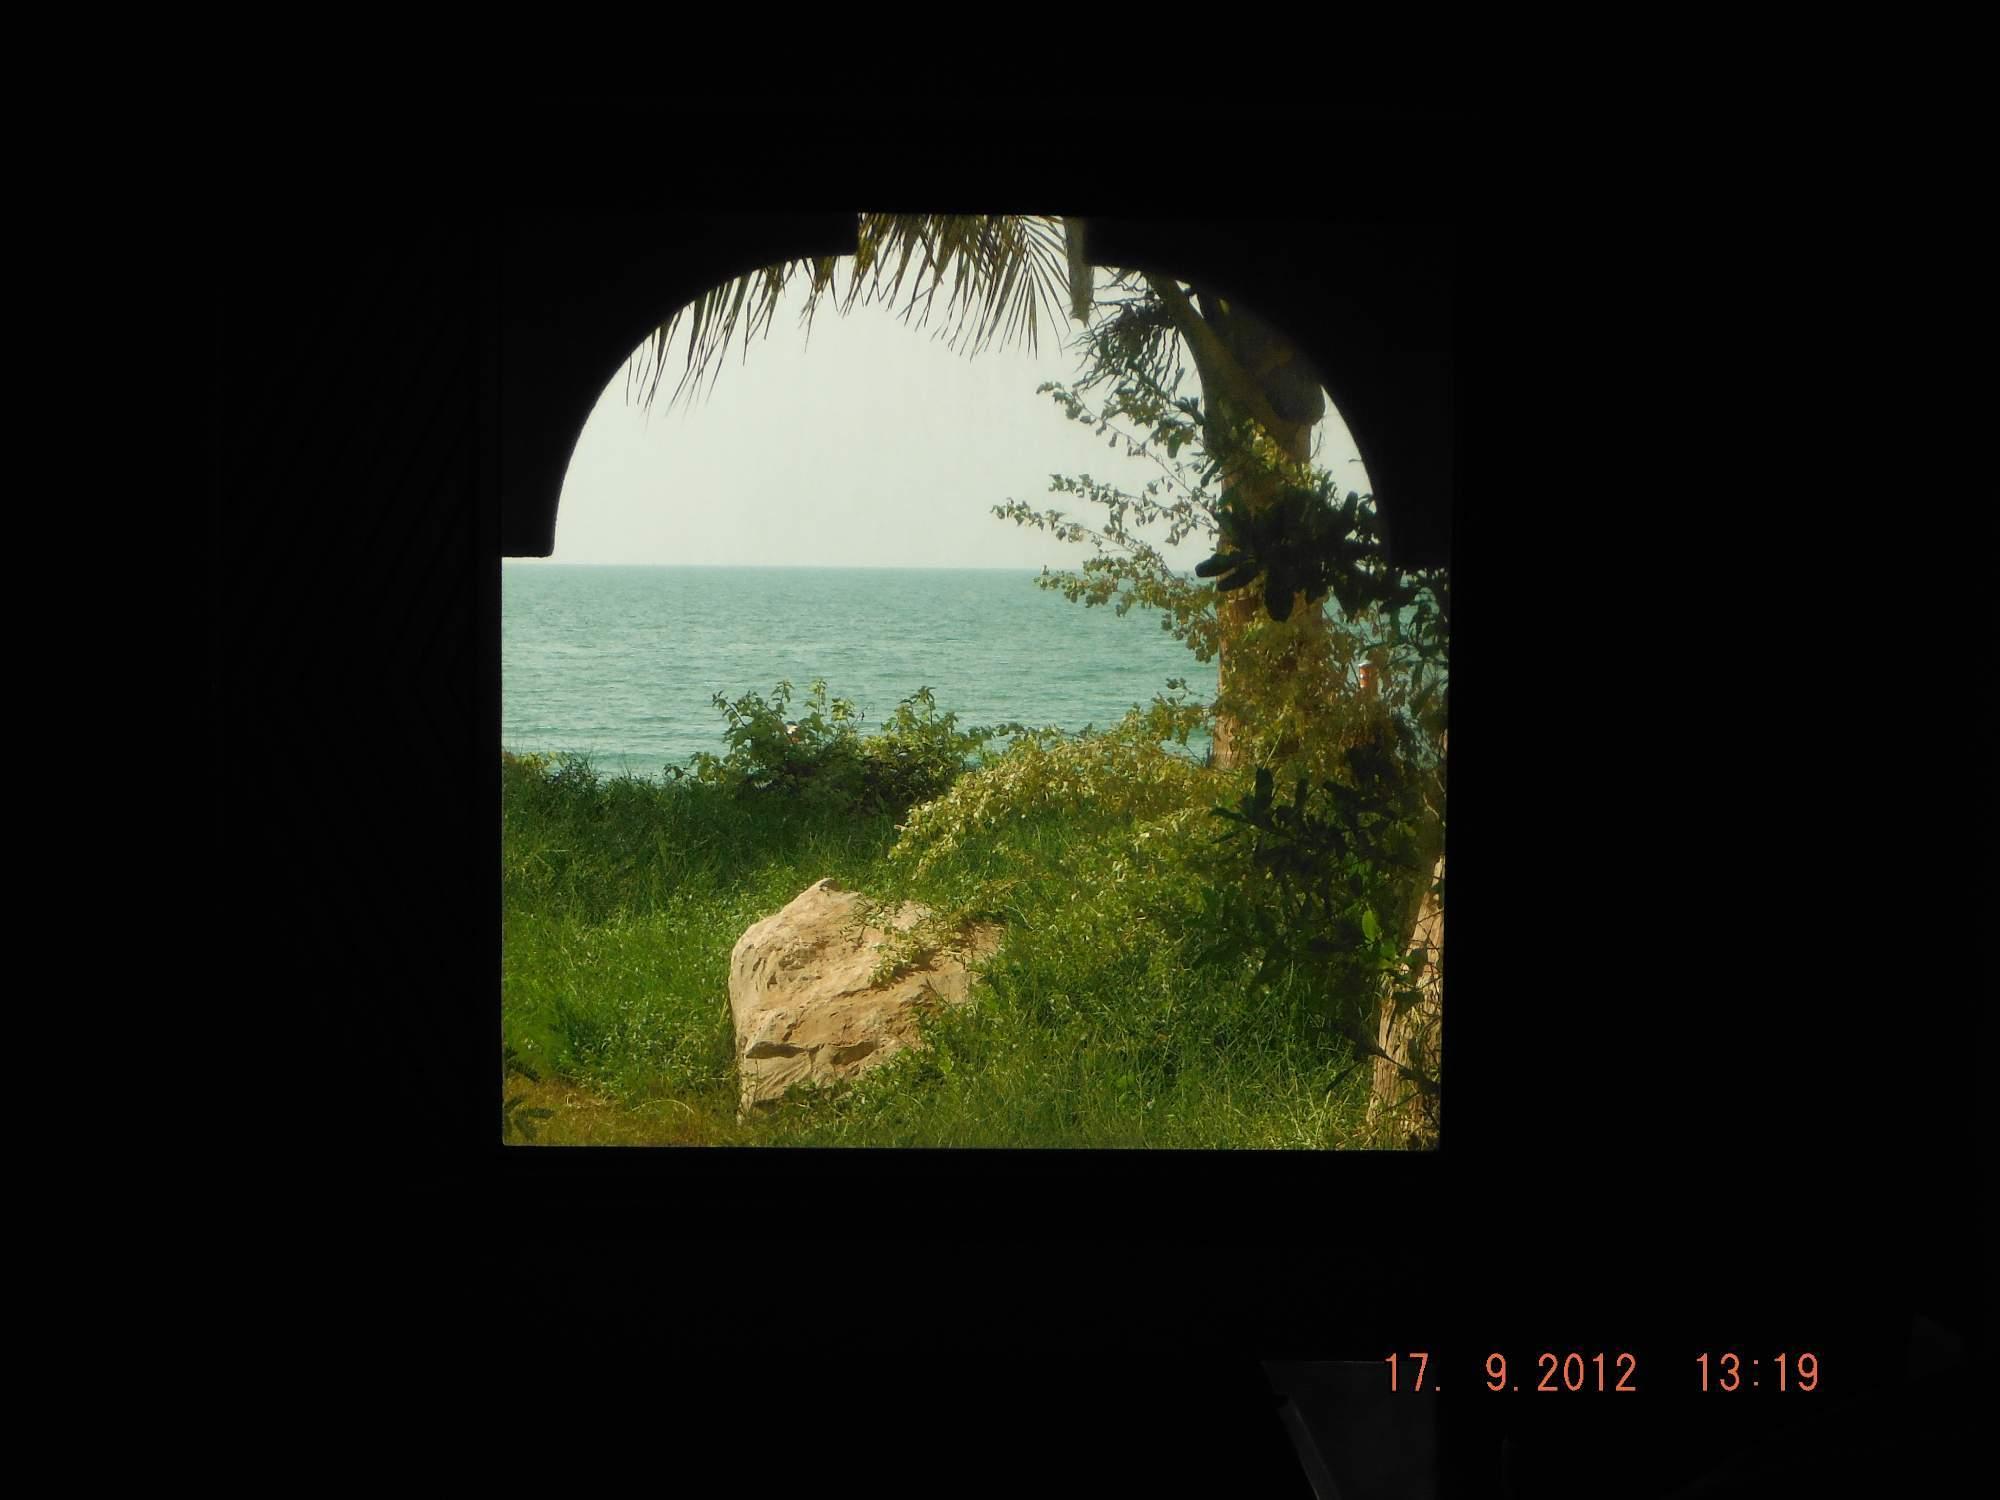 http://img24.rajce.idnes.cz/d2403/13/13214/13214242_a1e43f49e51a1daa7632f800d4edae3f/images/SAE488.jpg